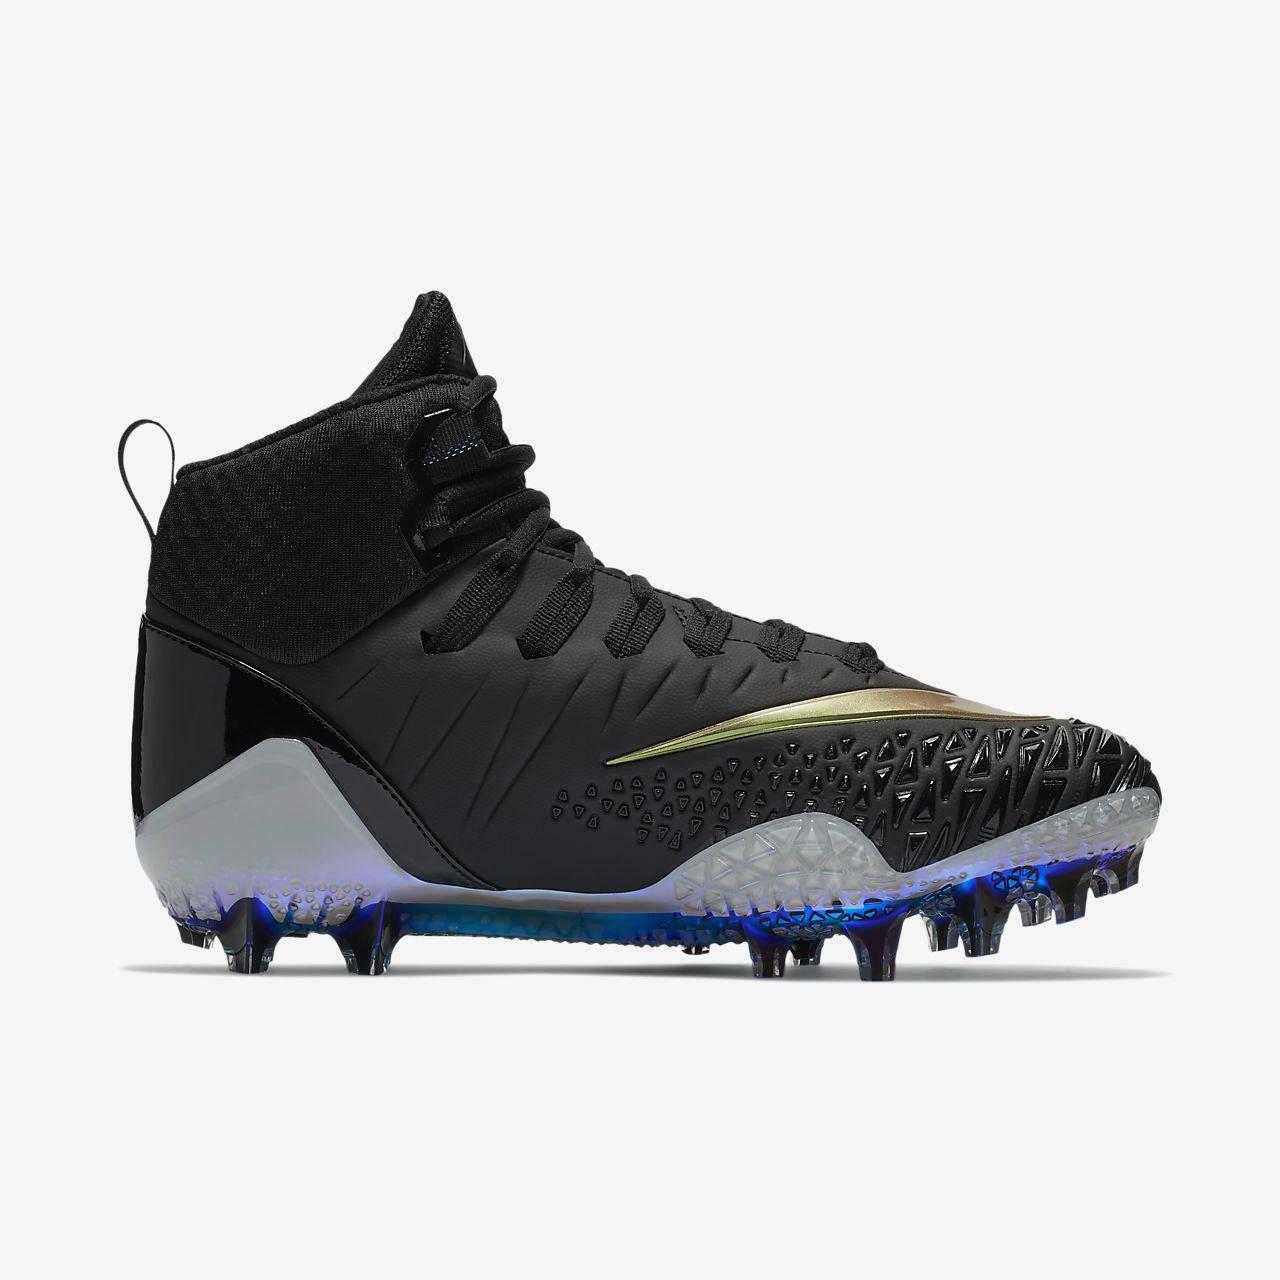 huge discount 53585 e5cbb nike sock football cleats mens lebron 14 shoes